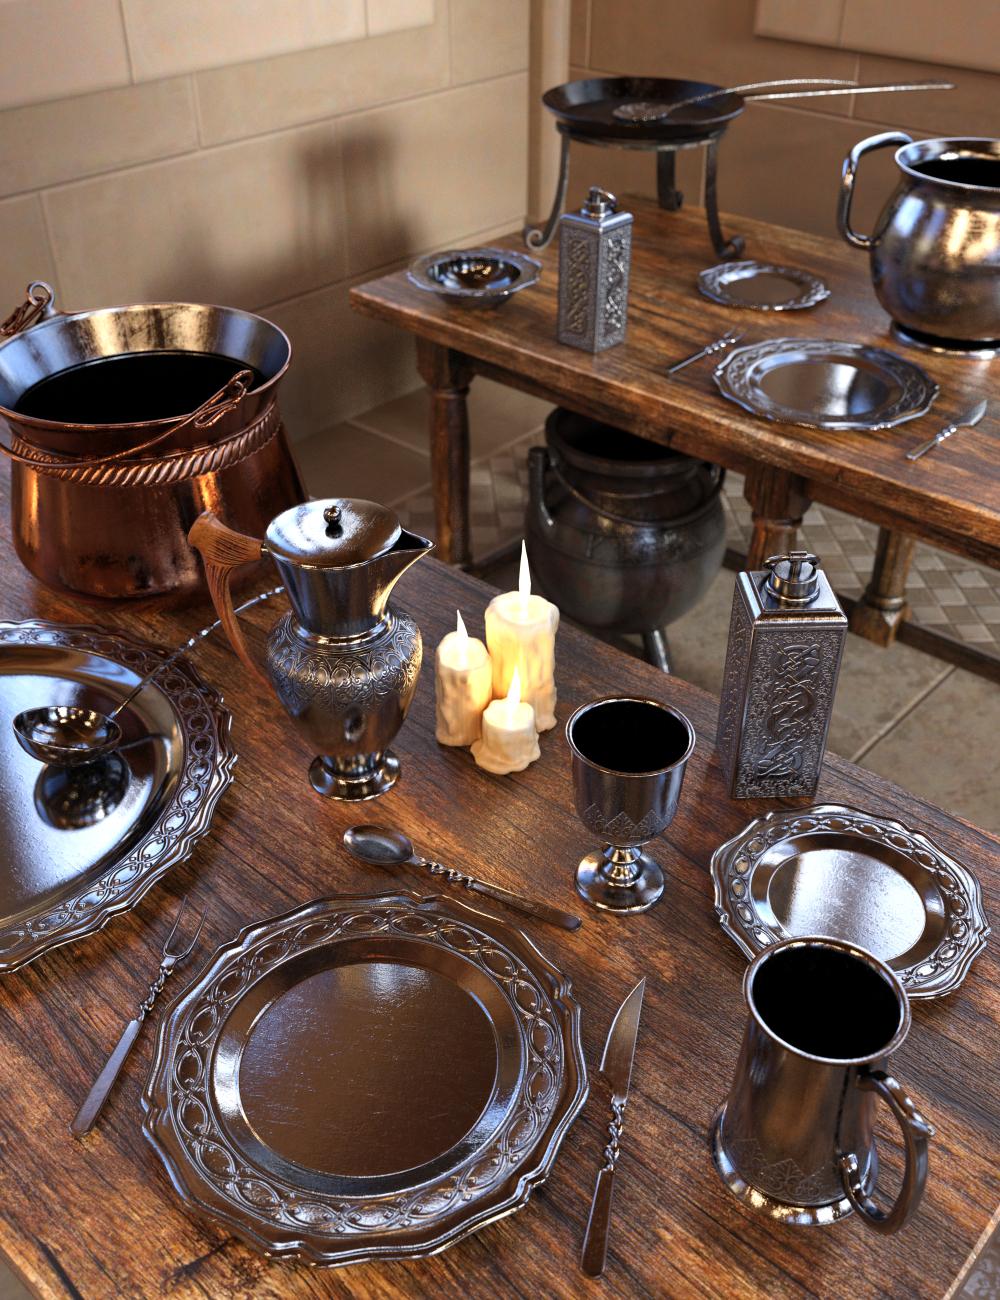 Medieval Kitchenware by: Merlin Studios, 3D Models by Daz 3D